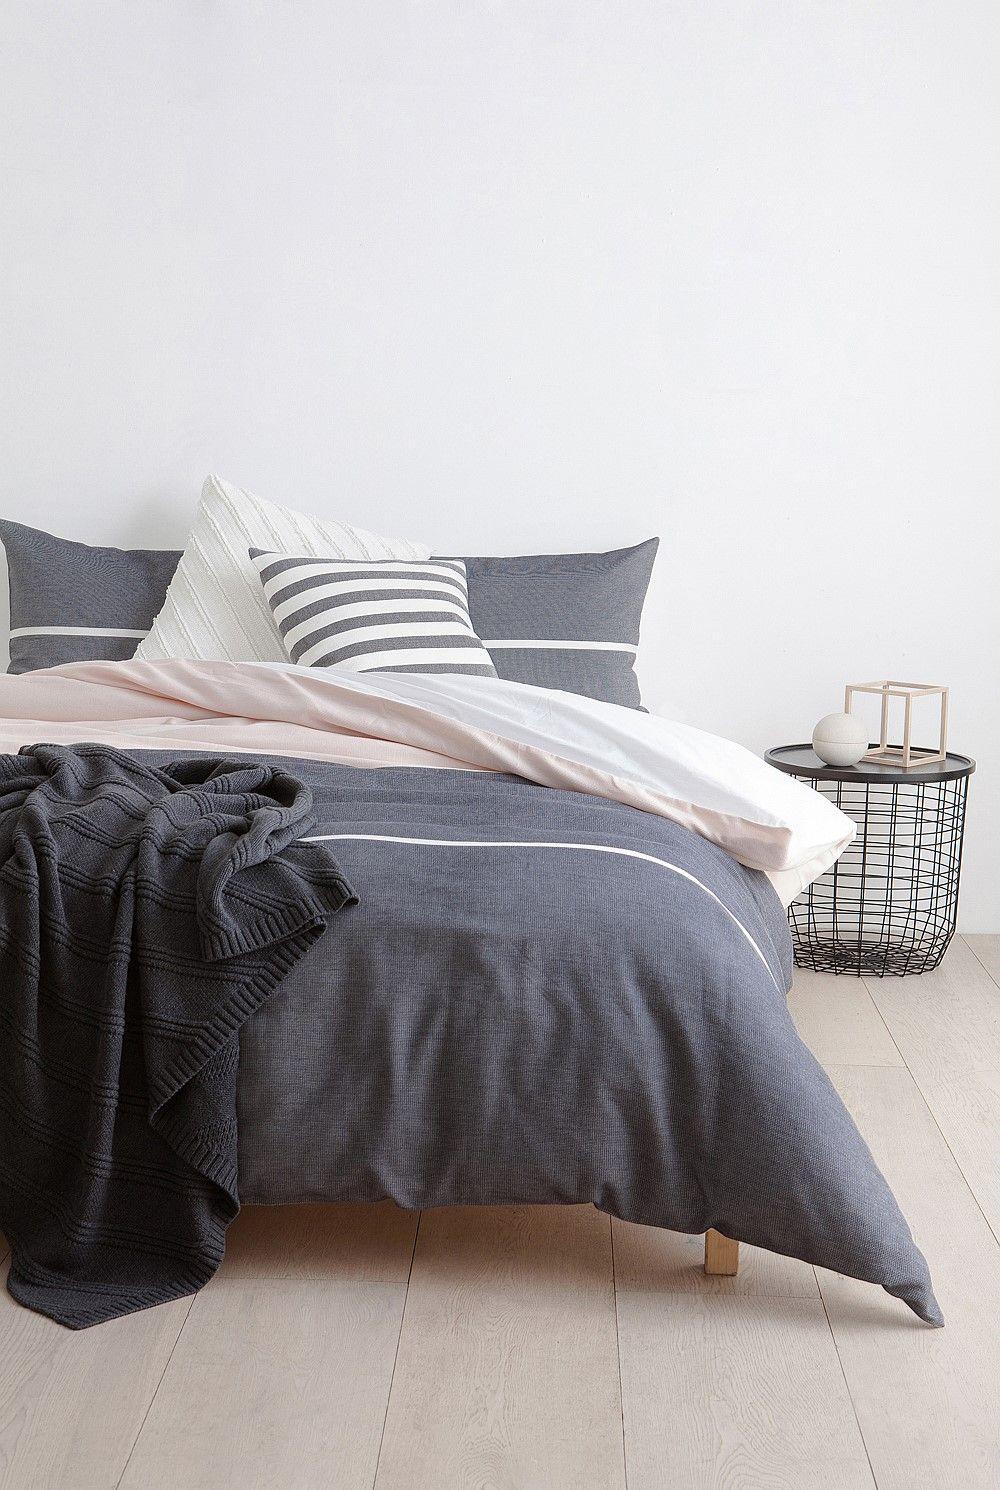 12 Best Australian Bed Linen Brands to Shop This Spring